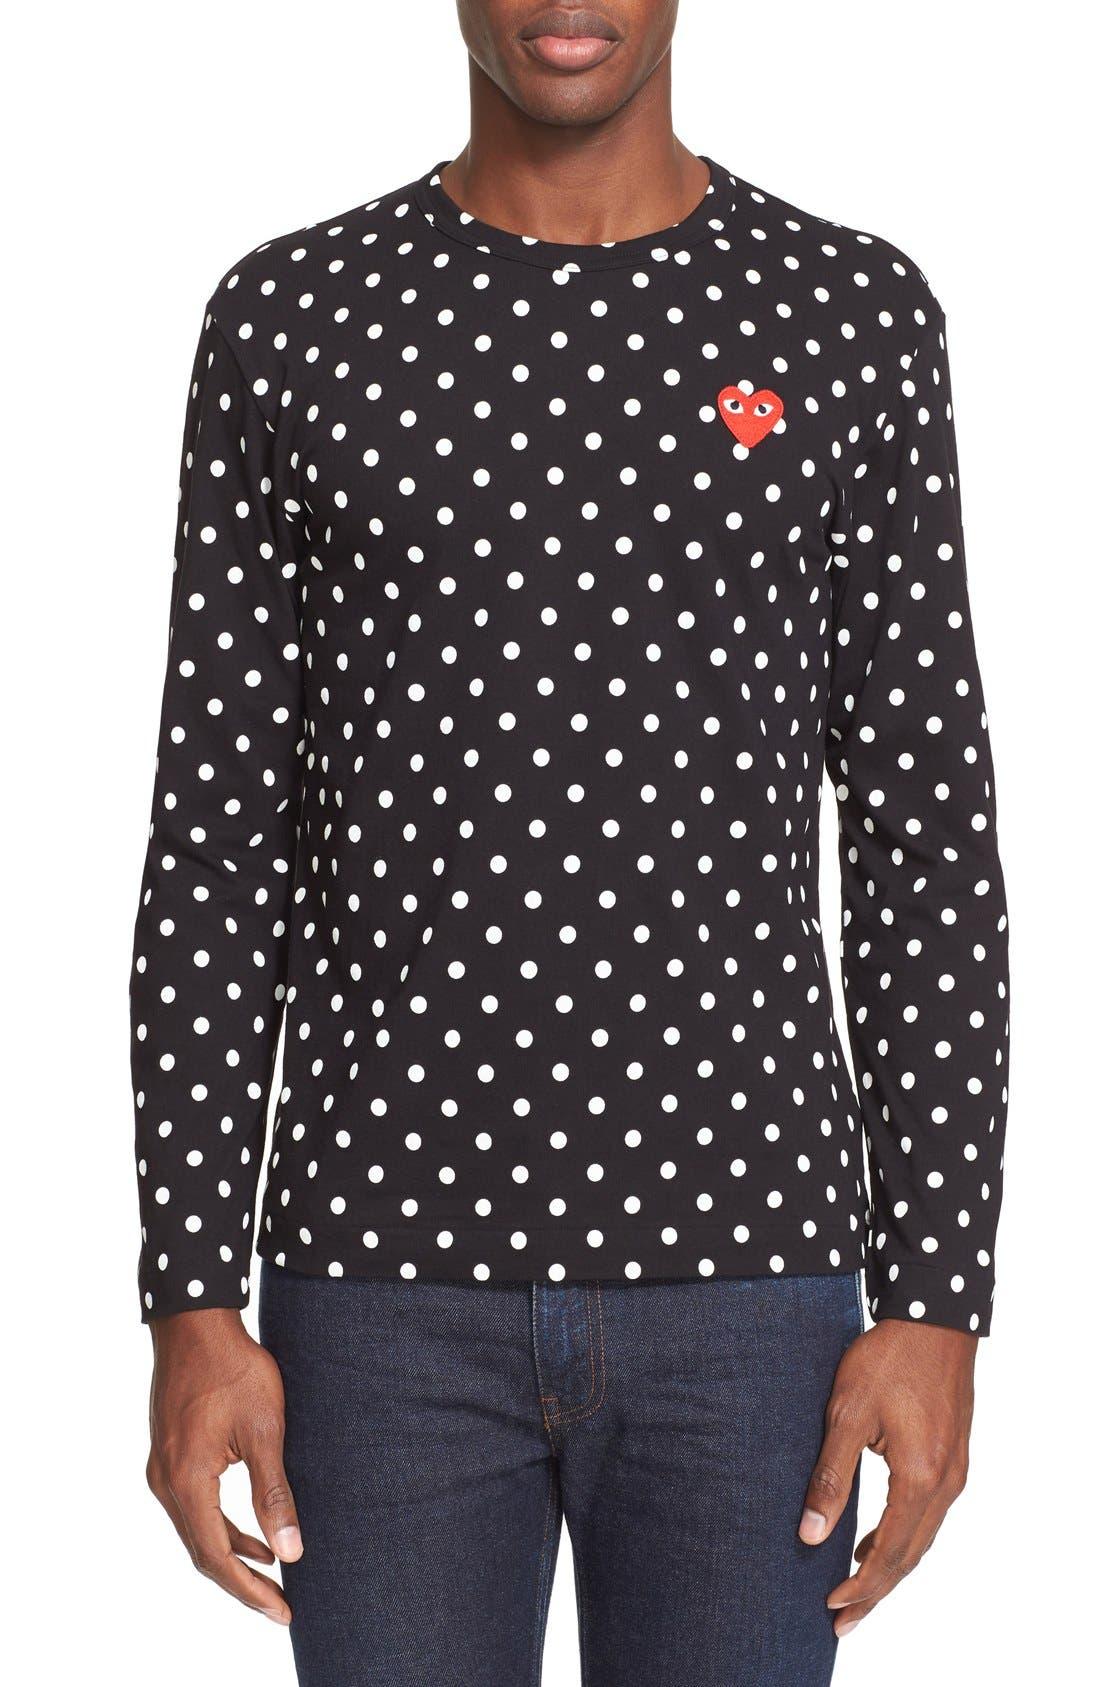 Black Designer T-Shirts for Men: Henley, Long- & Short-Sleeve ...